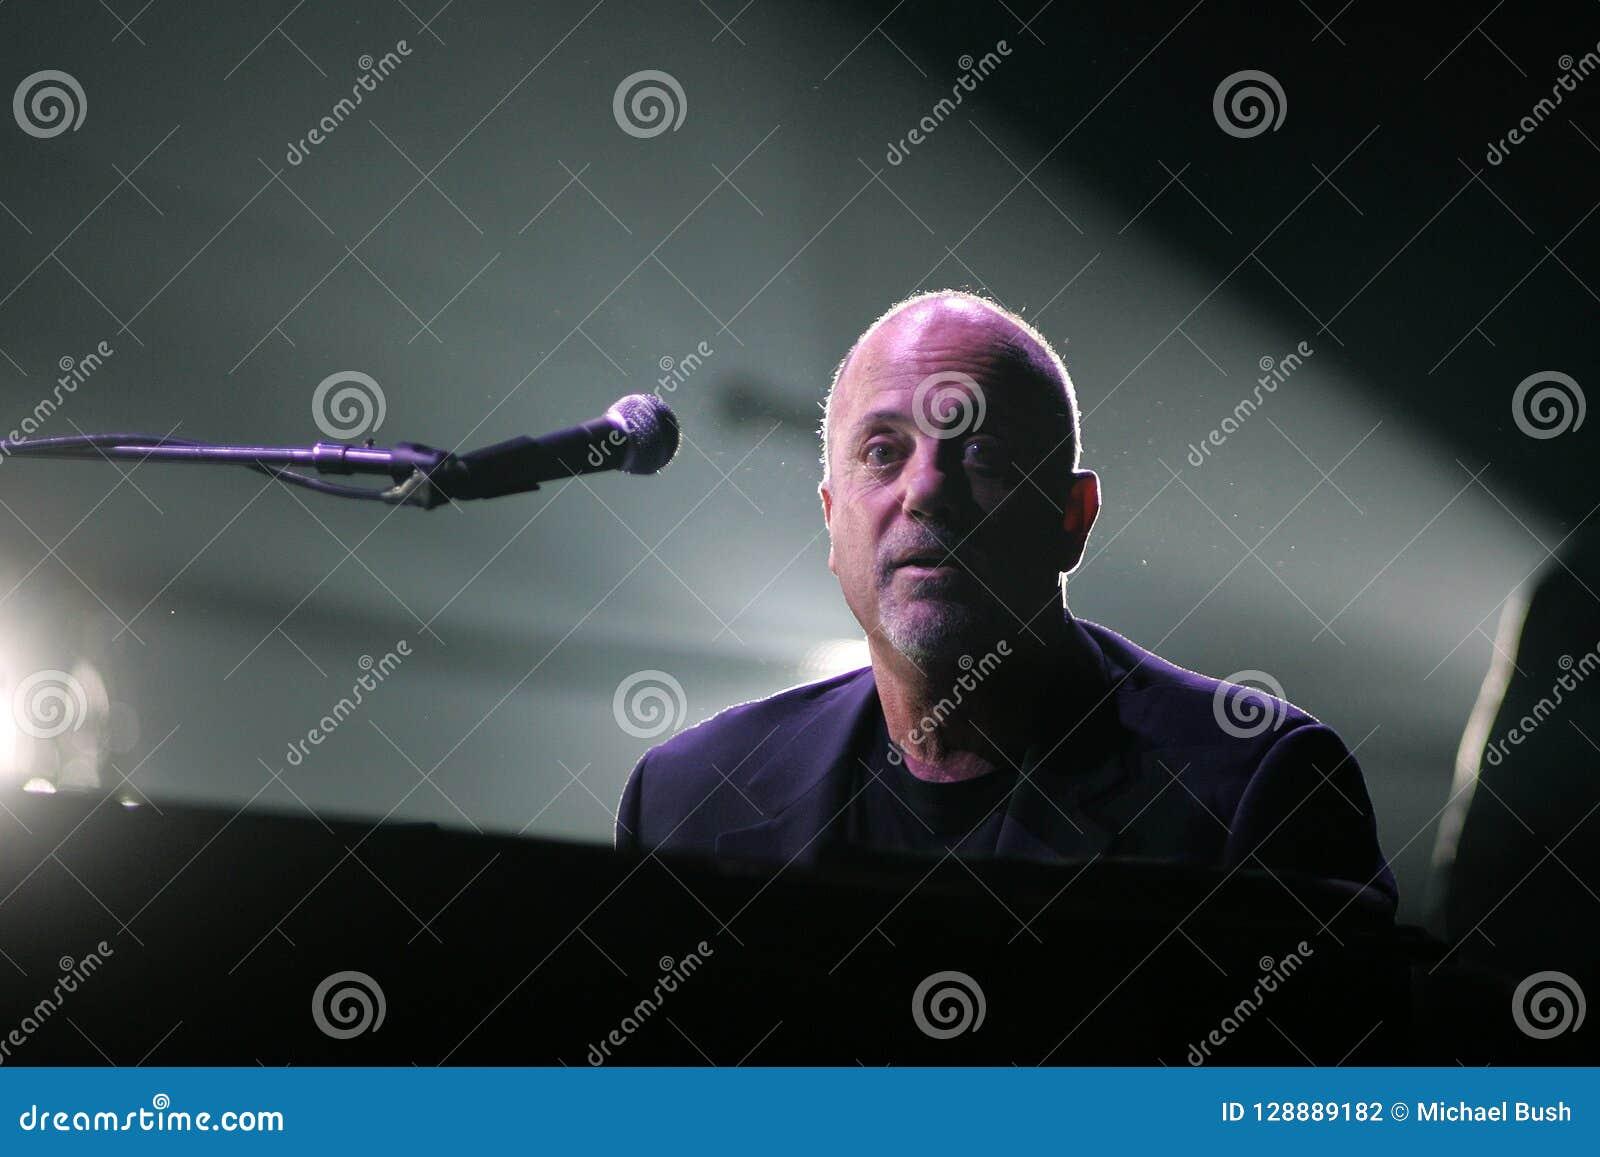 Billy Joel Performs in Concert